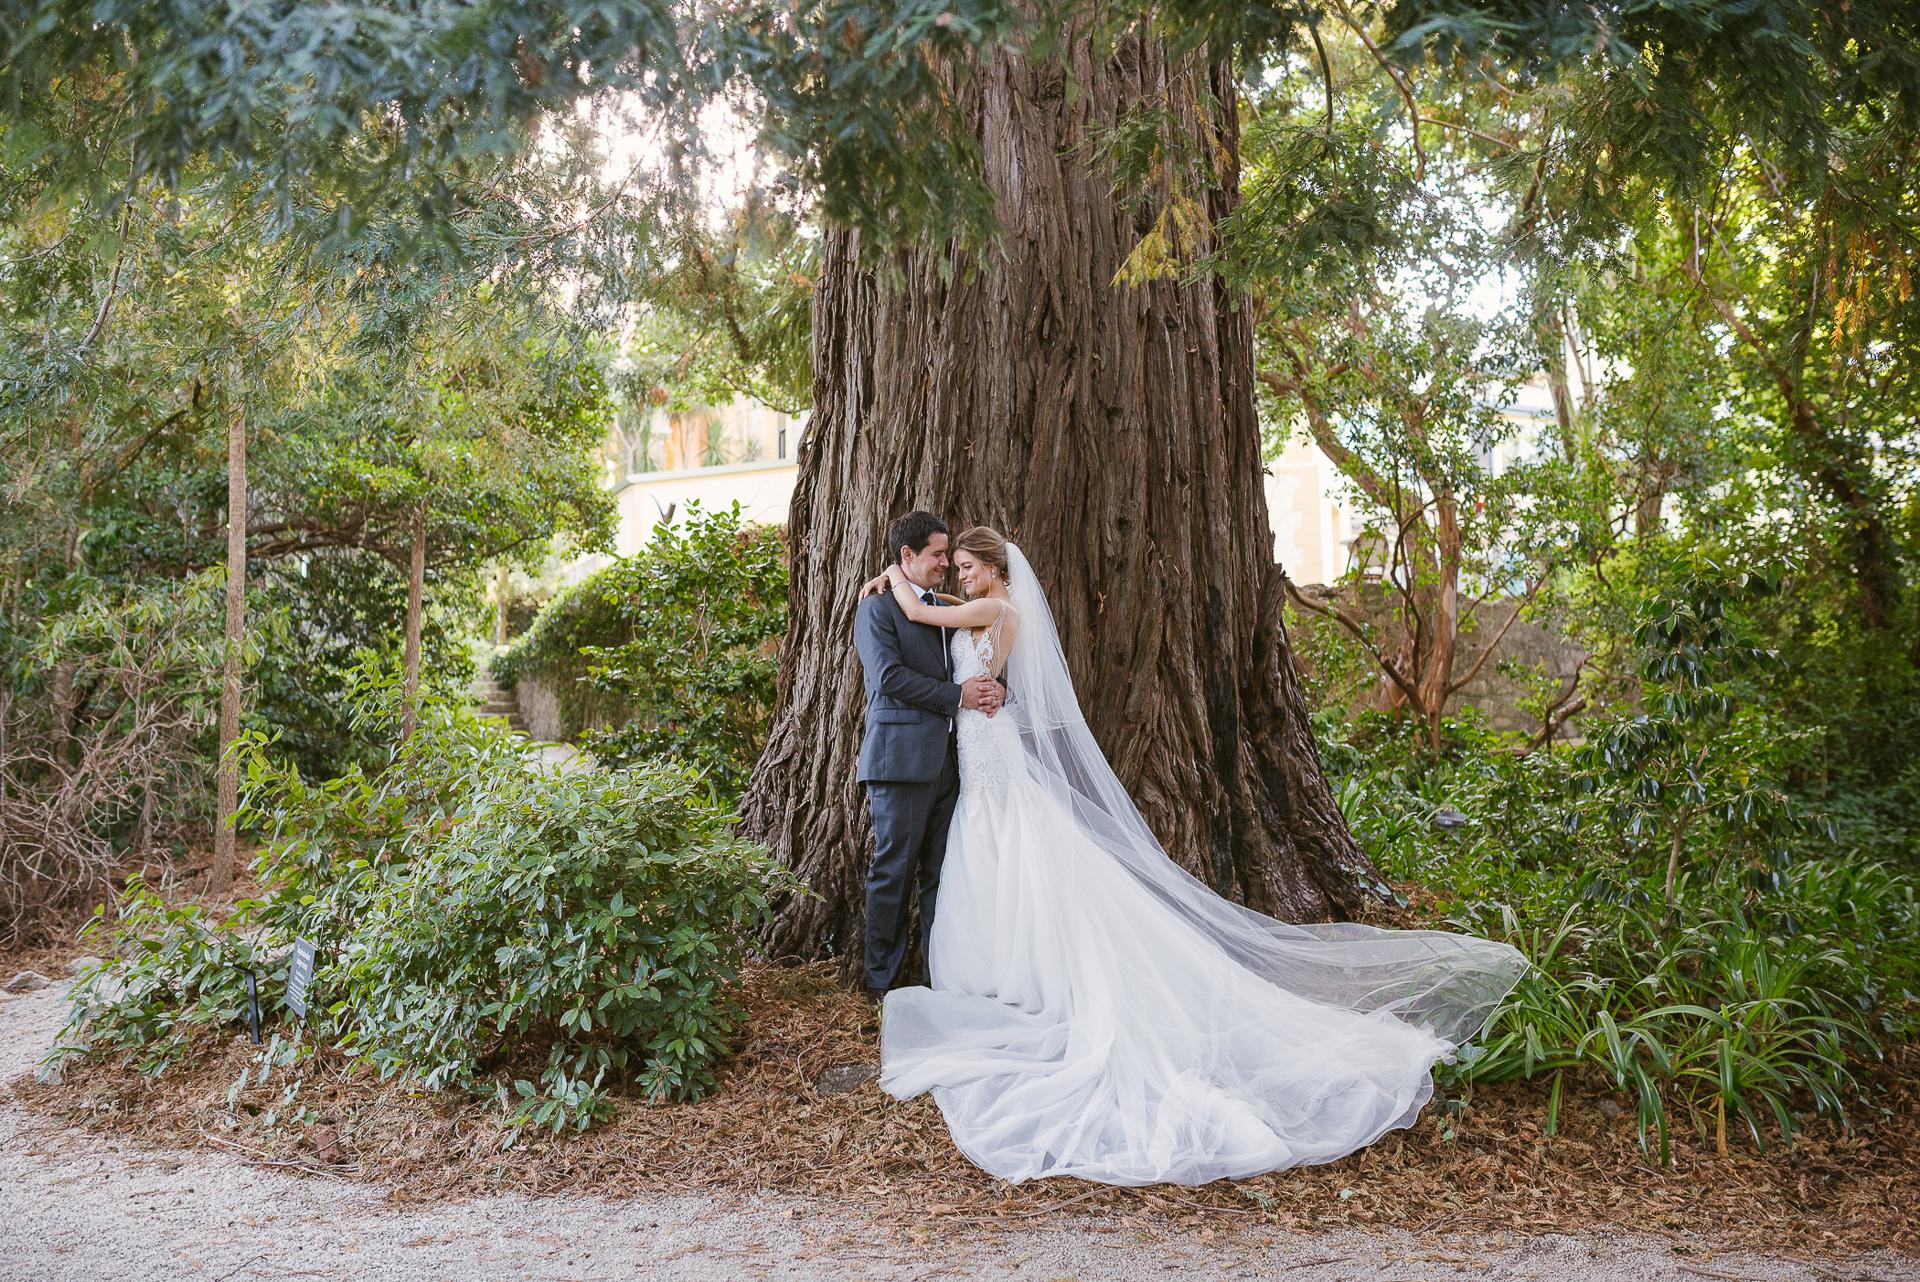 Mount Lofty House Wedding Venue by Luke Simon Photography